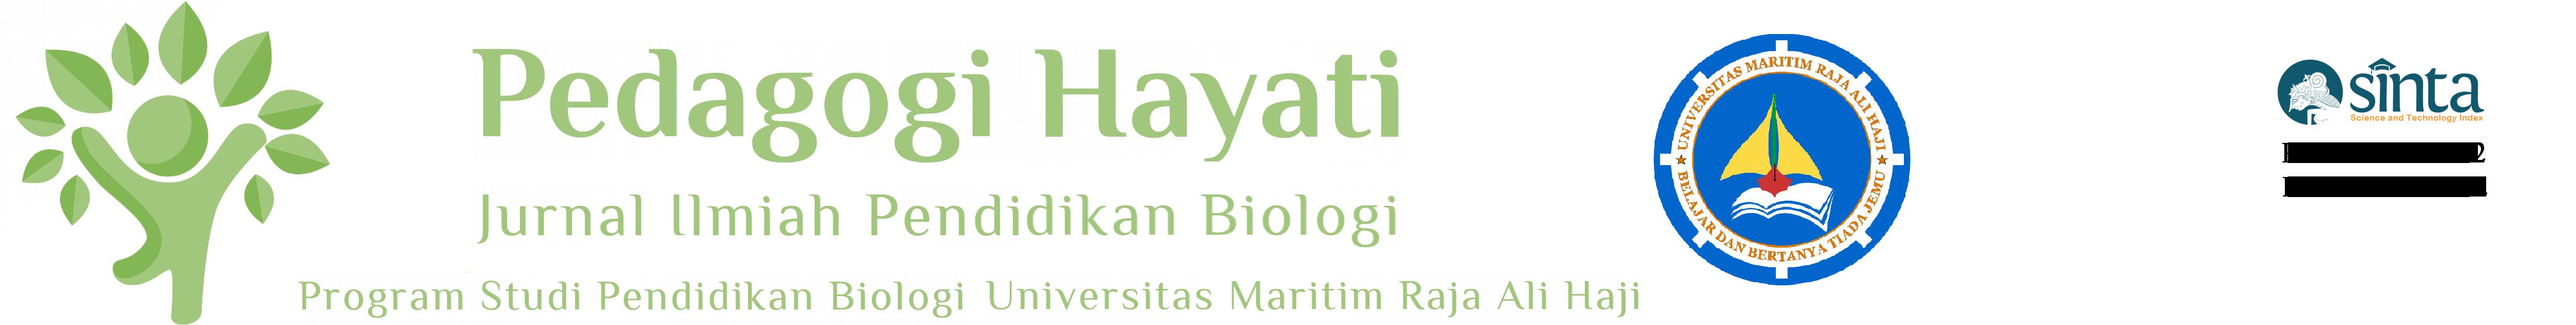 Pedagogi hayati jurnal ilmiah pendidikan biologi